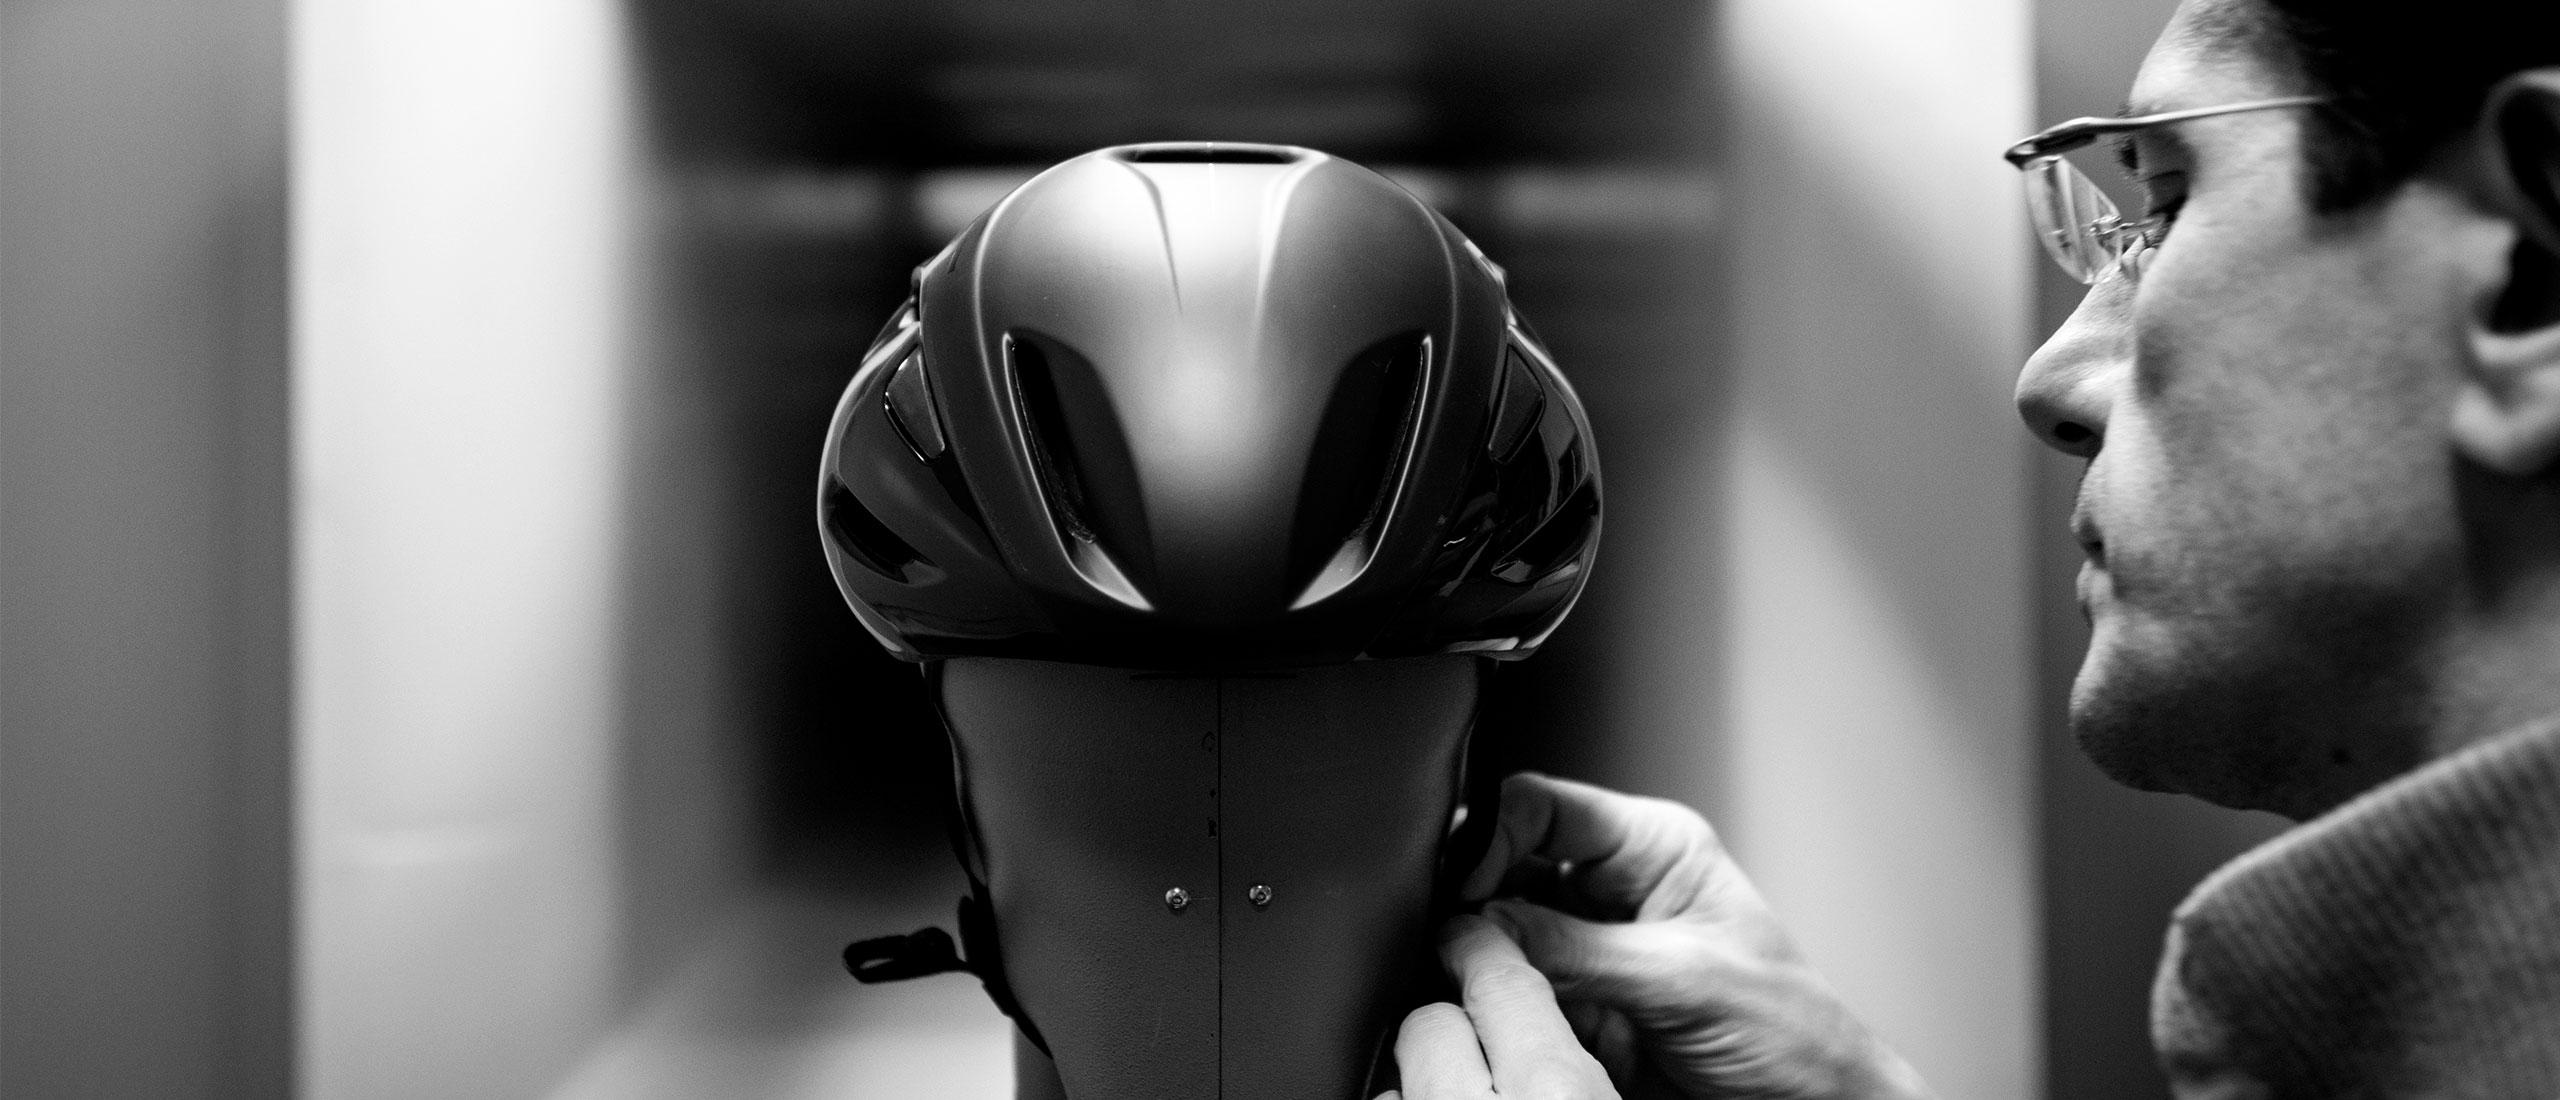 MET Manta Road, Aero and Cyclocross Helmet wind tunnel